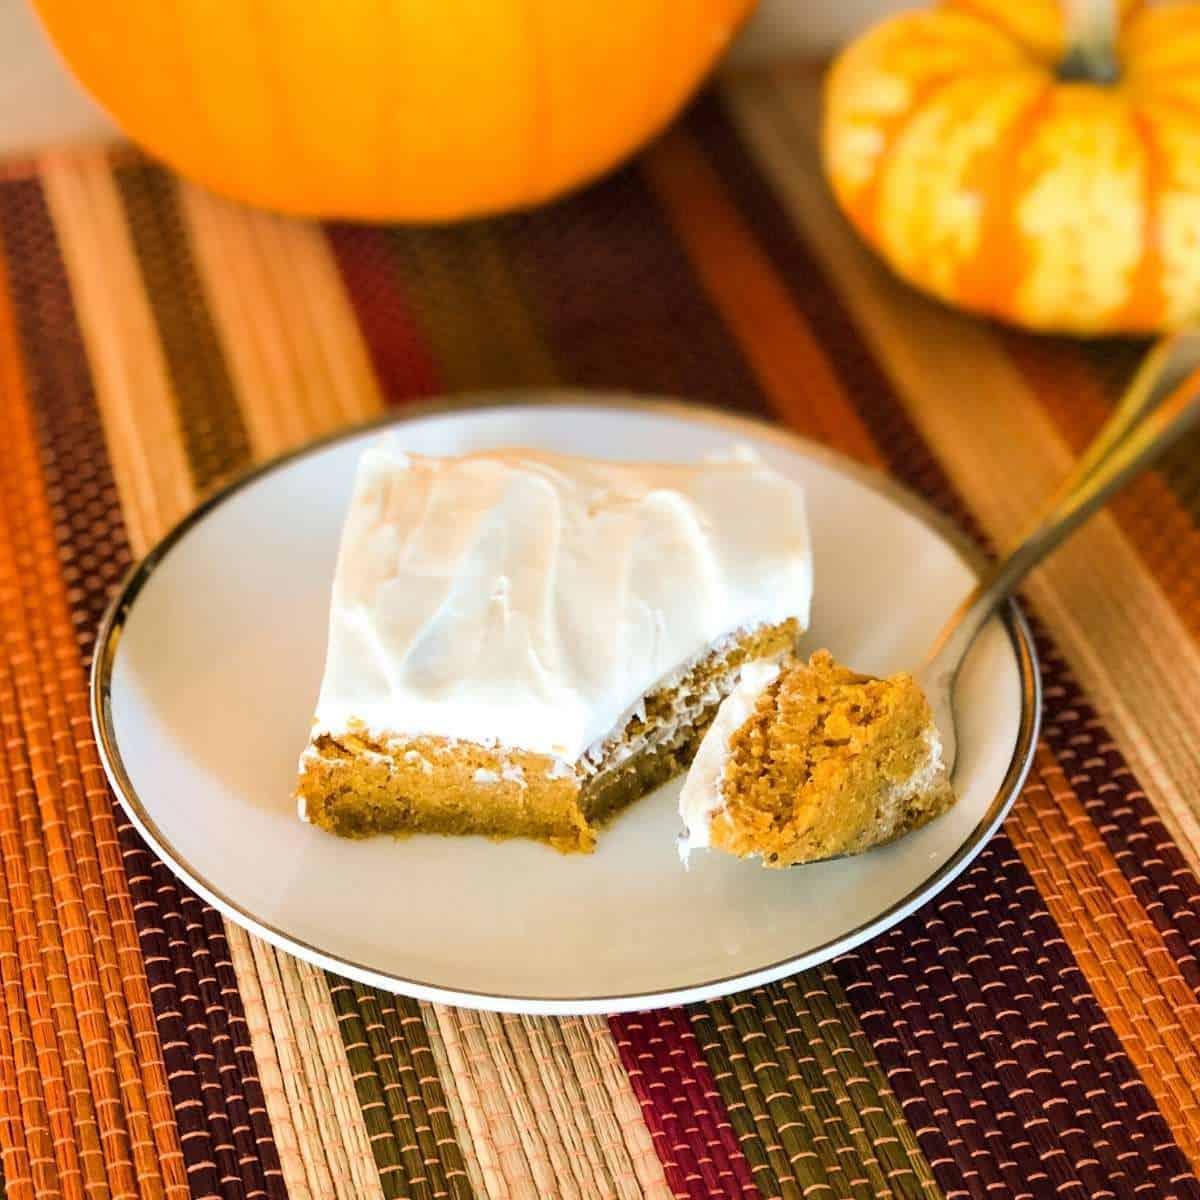 A pumpkin bar on a plate with a fork